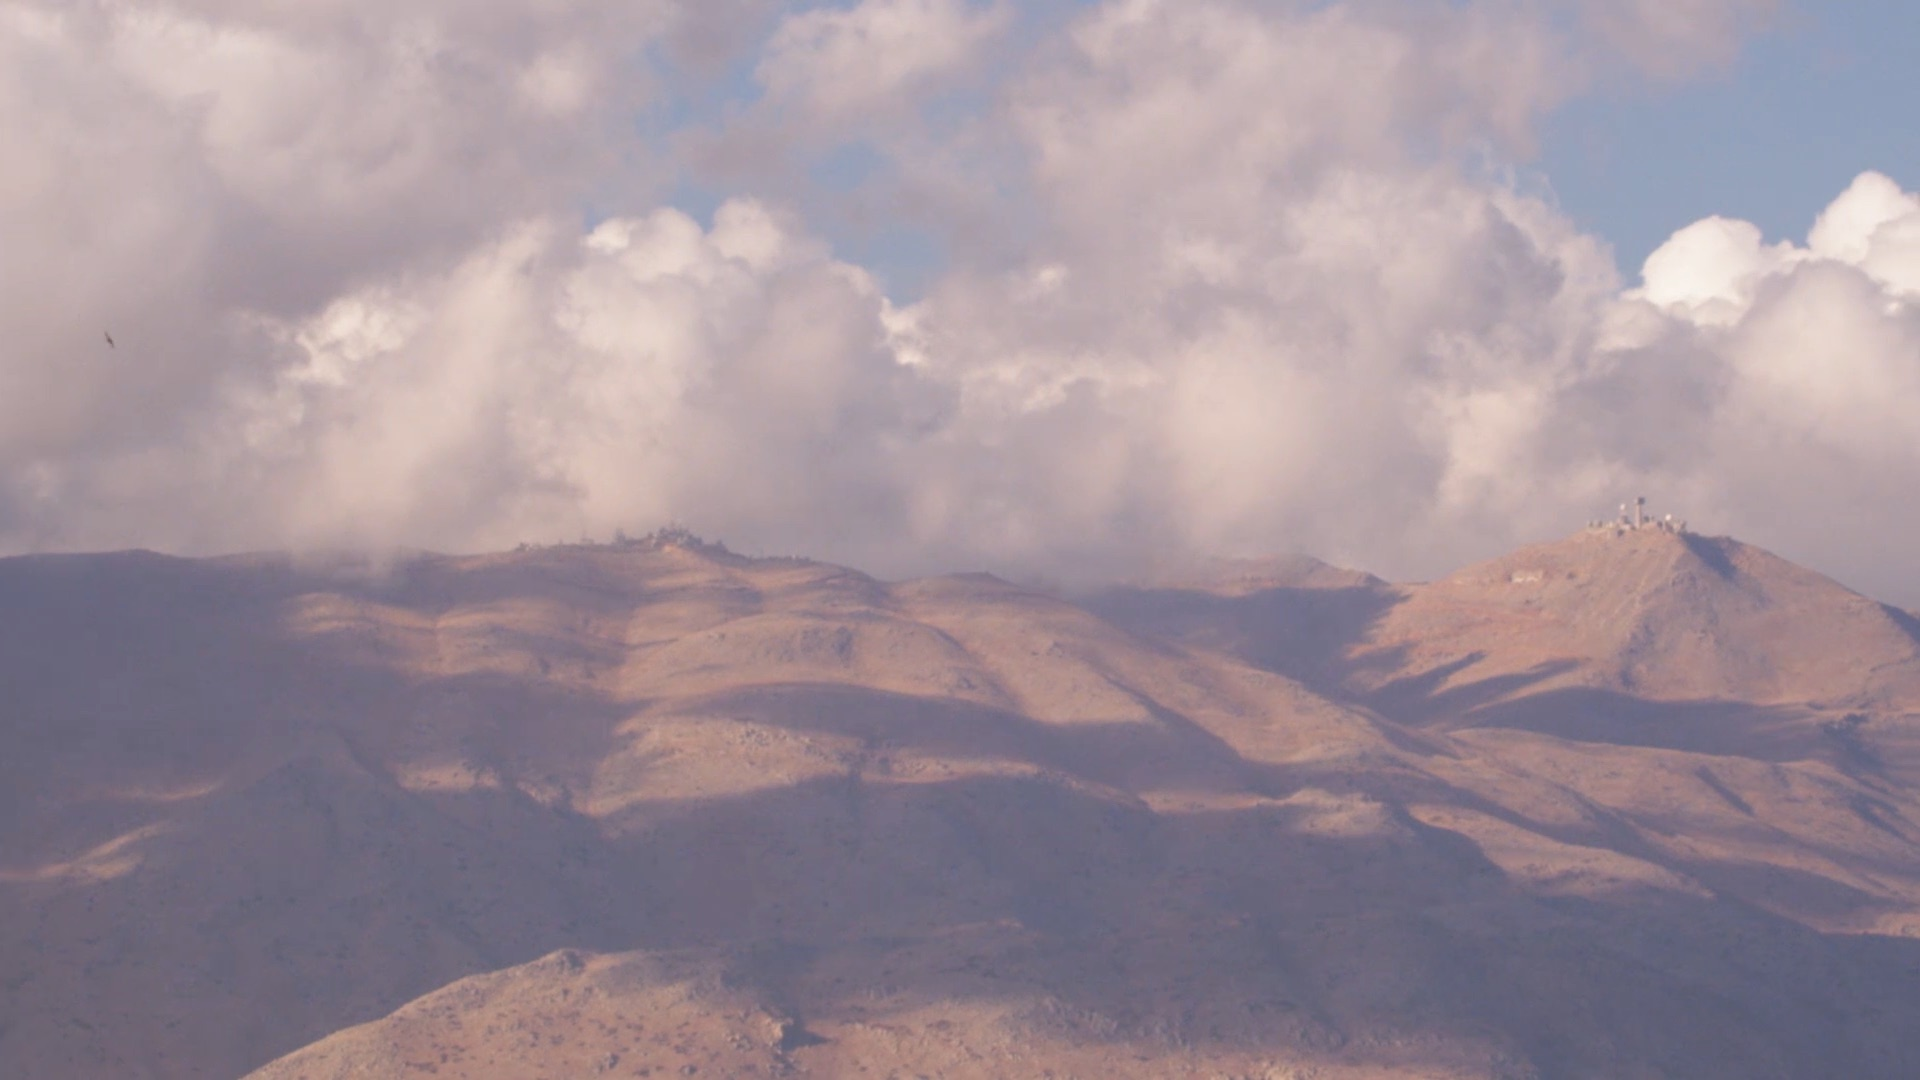 Mountain-of-Transfiguration-Location-1.jpg